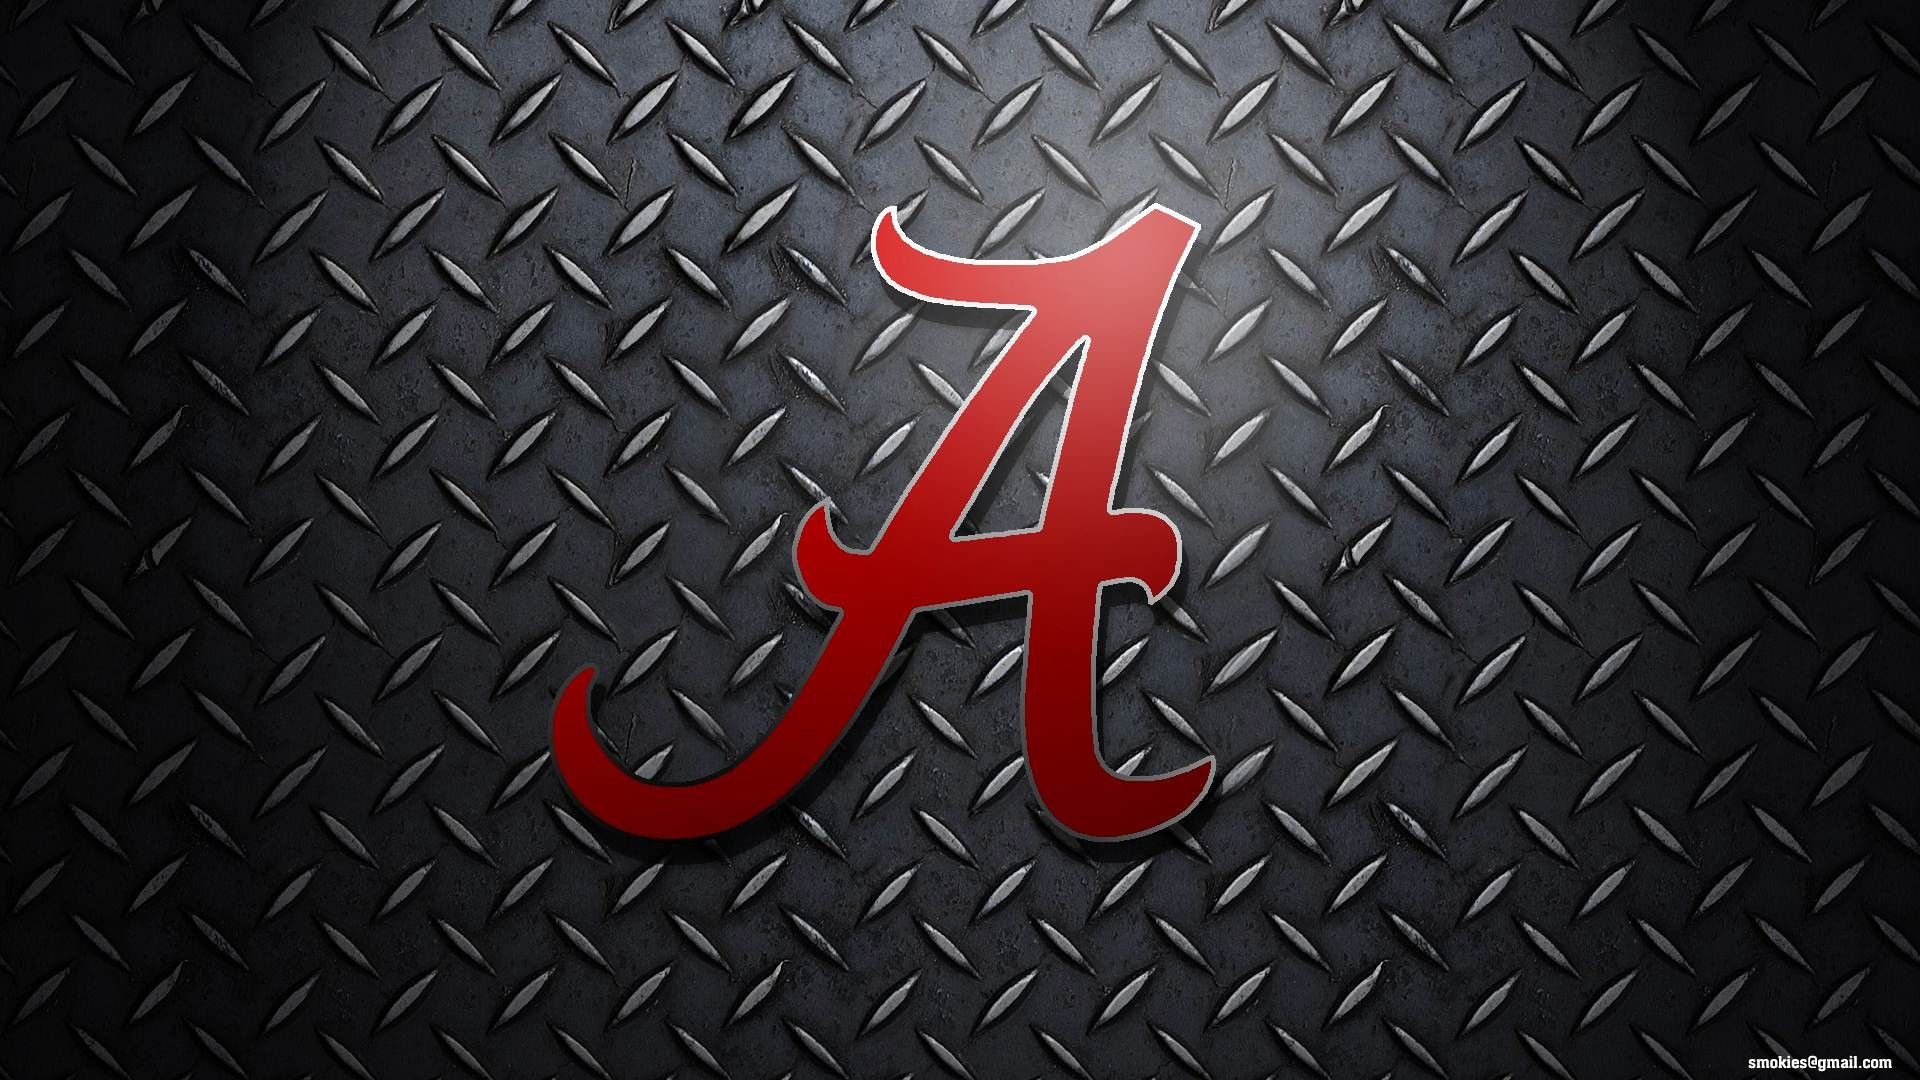 Auburn football screensavers and wallpaper 69 images - Alabama backgrounds ...